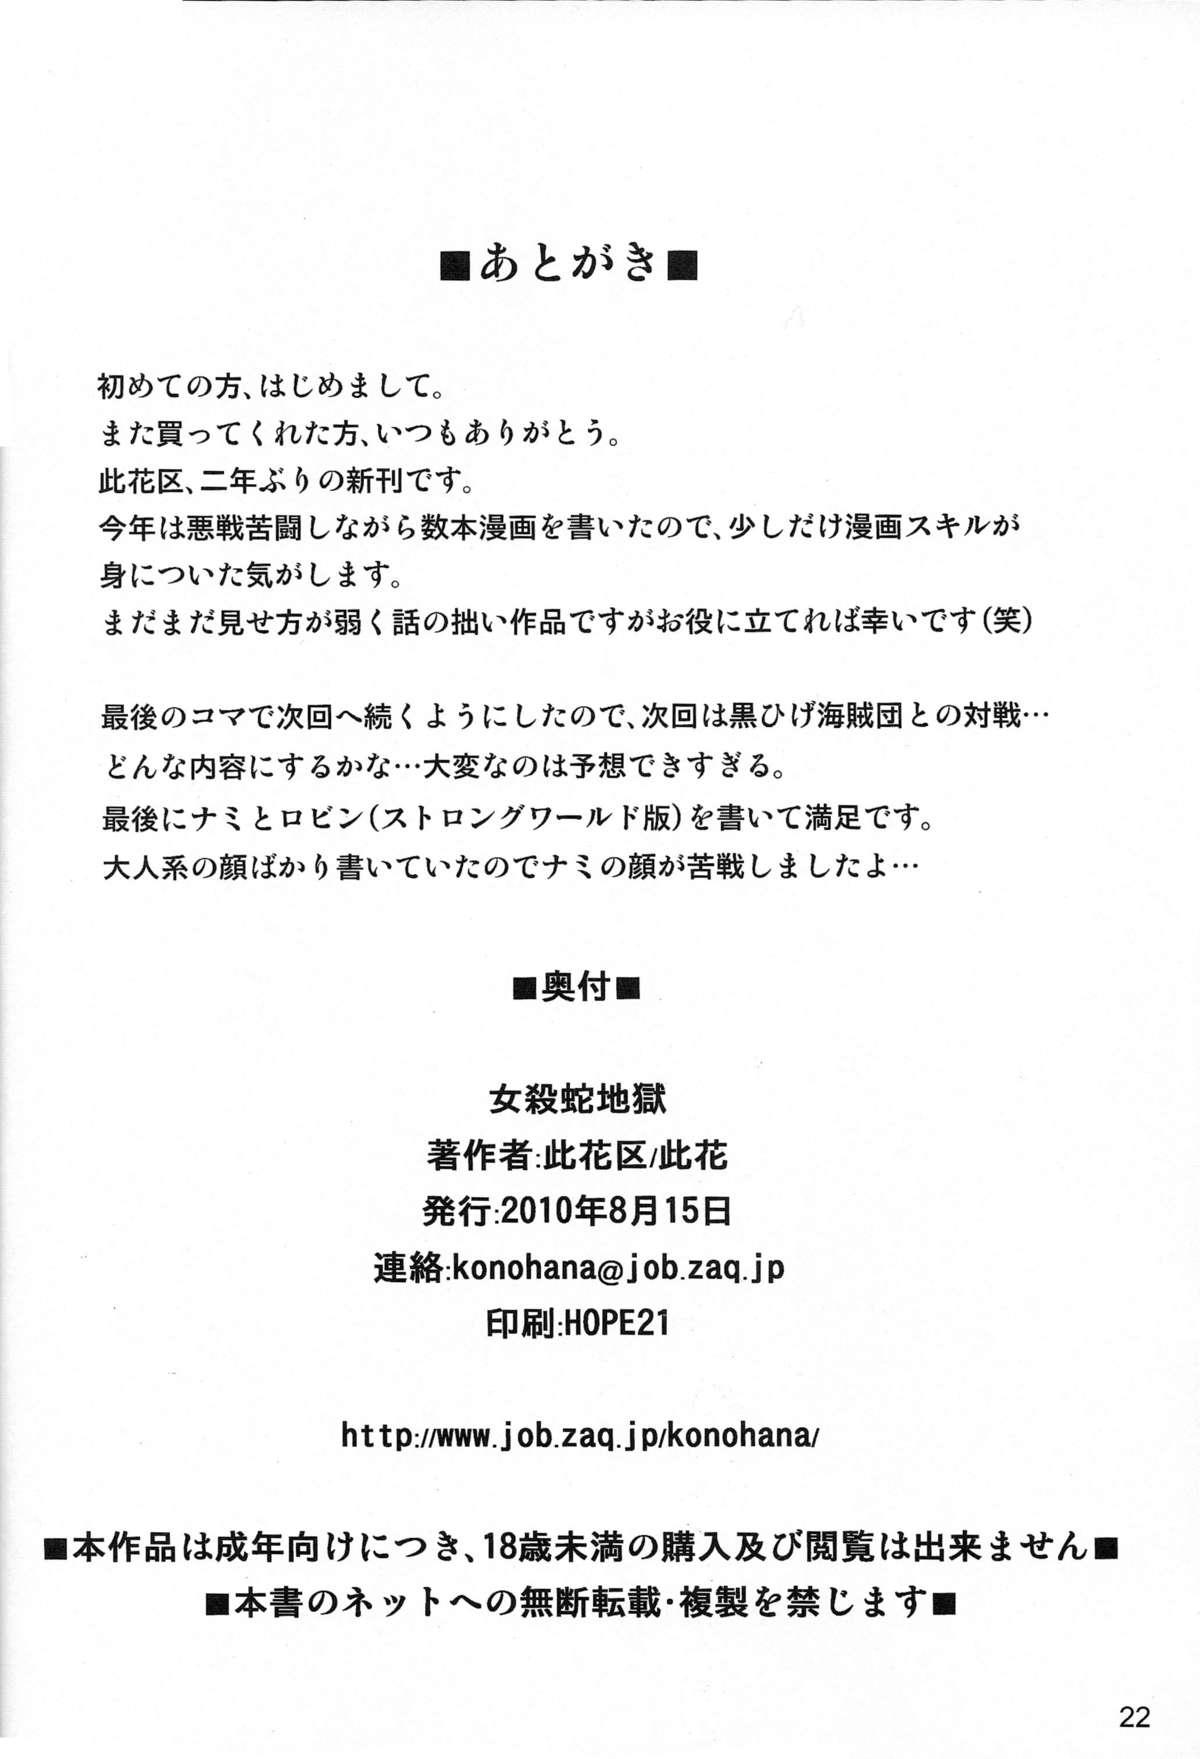 Onnagoroshi Hebi no Jigoku | Hell of the Woman Killing Snake 19